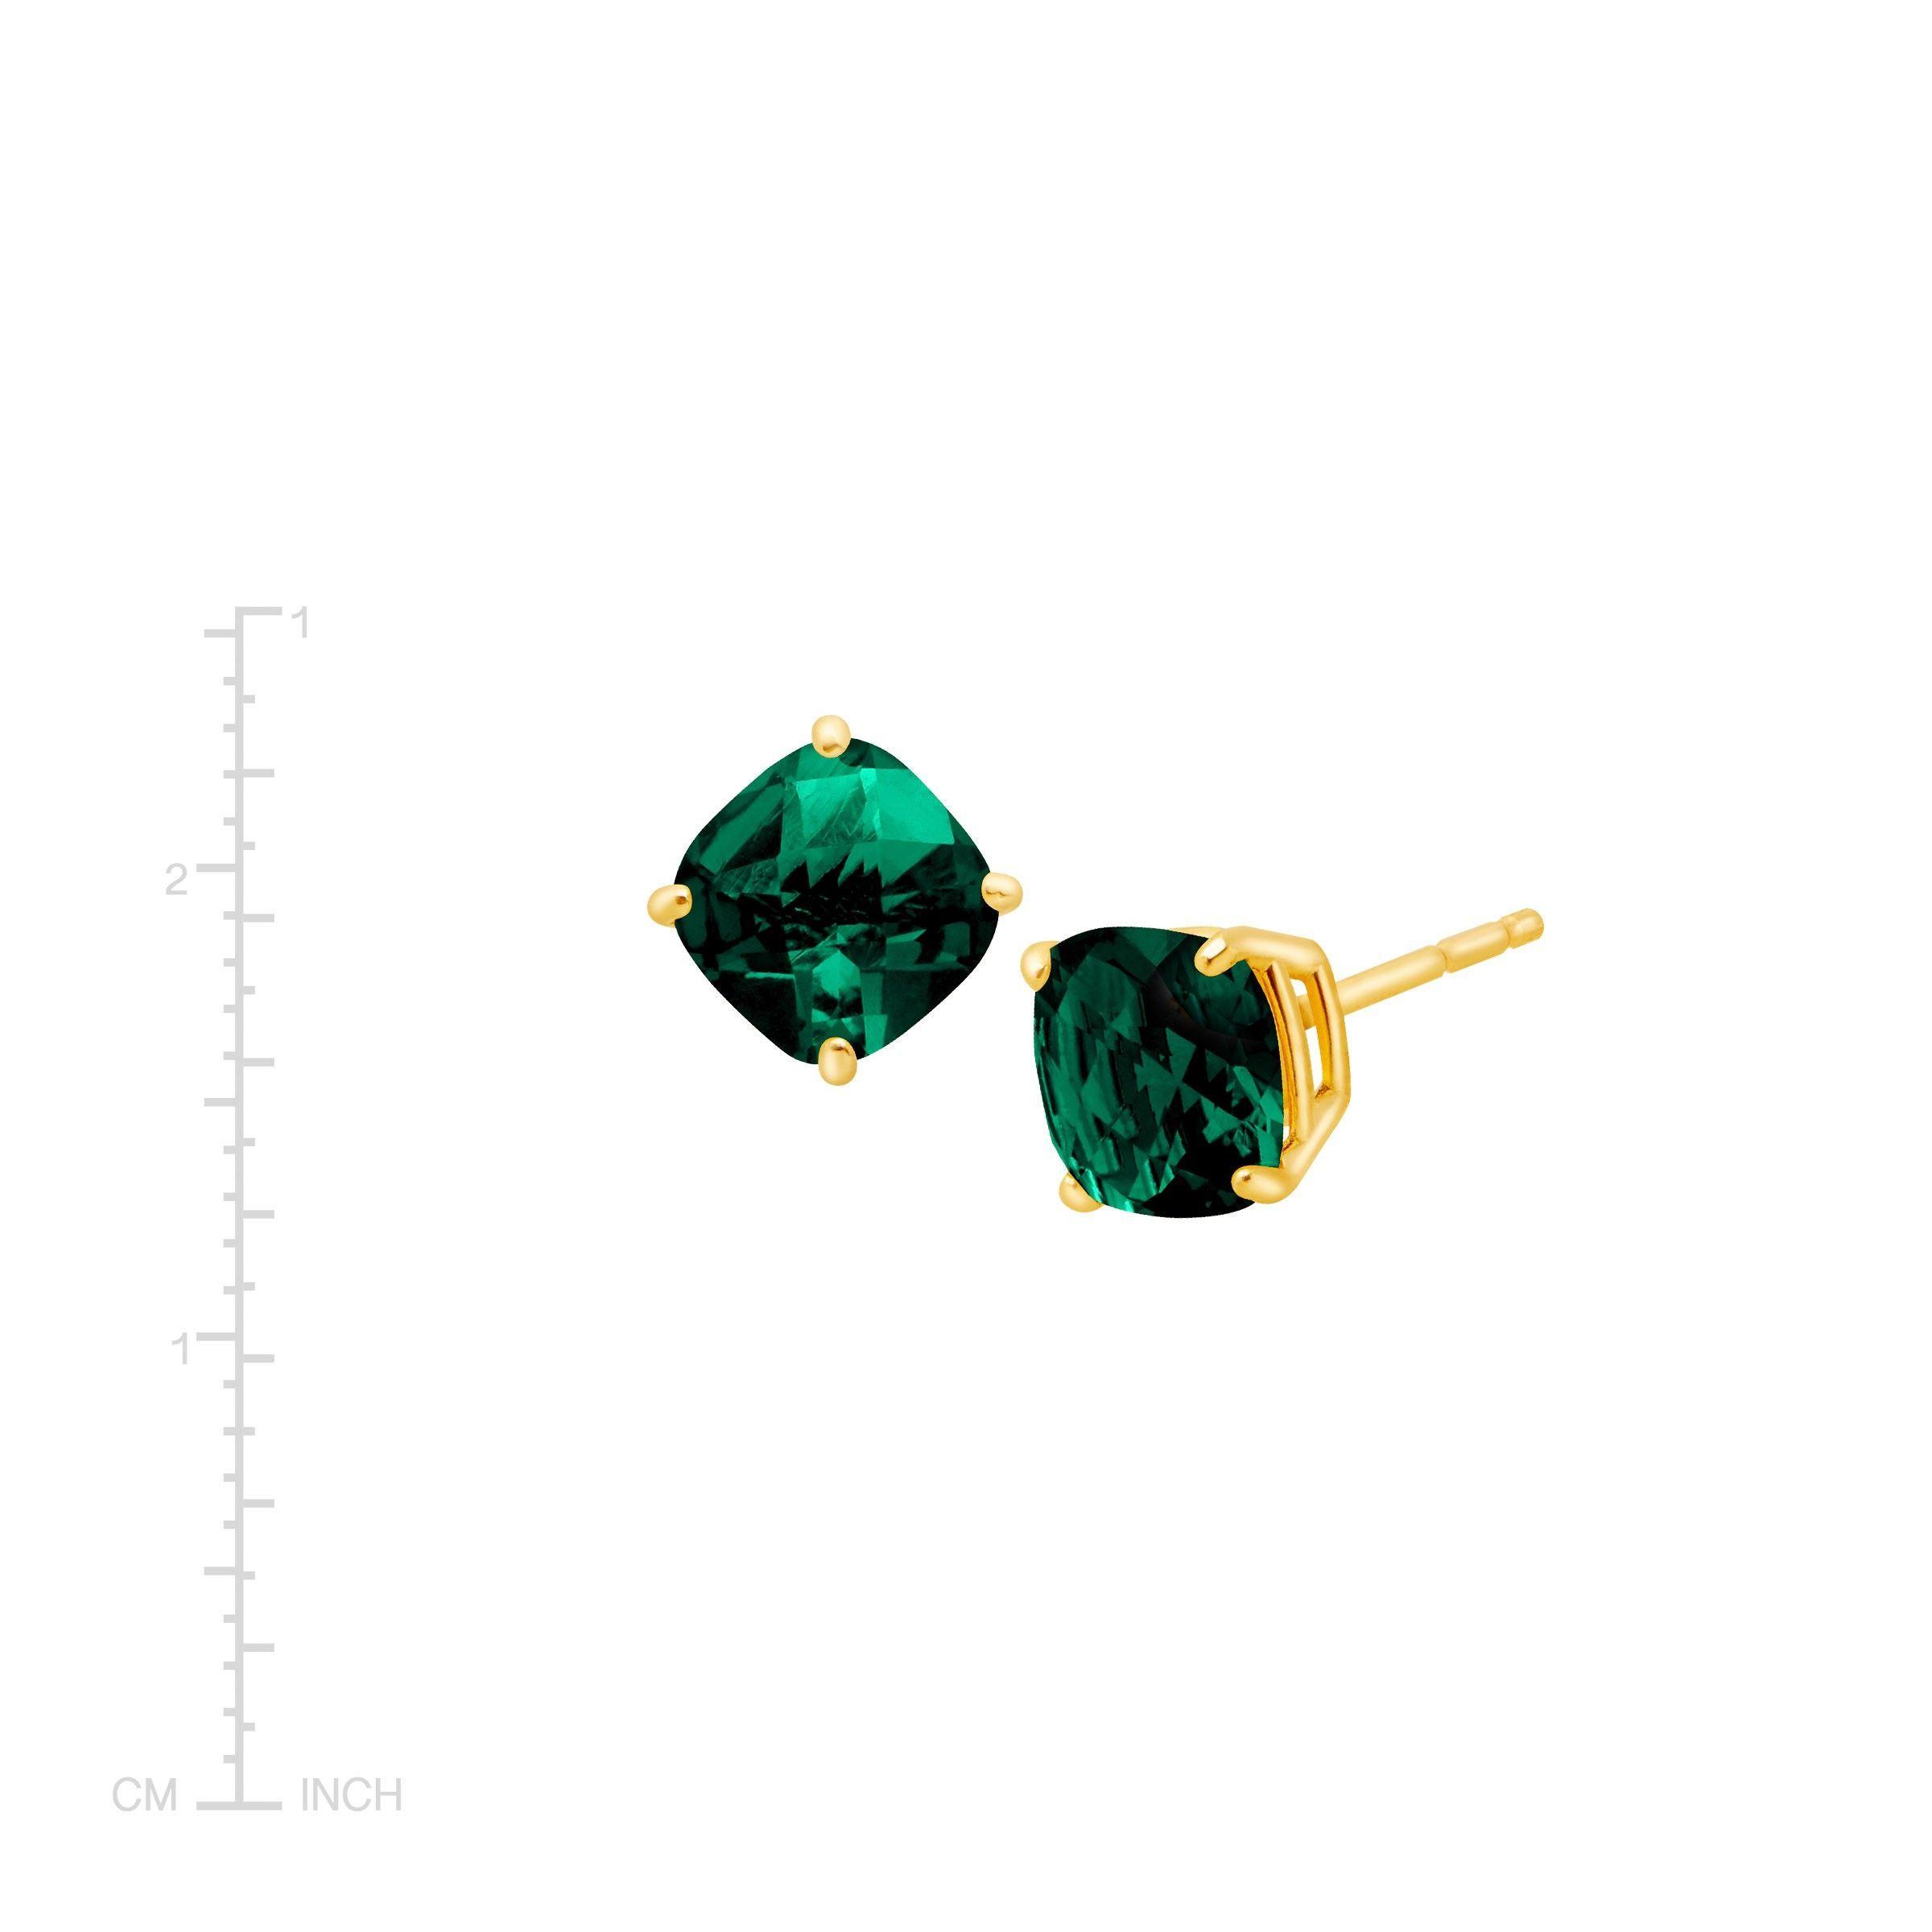 Cushion-Cut-Color-Stone-Stud-Earrings-in-14K-Gold thumbnail 18